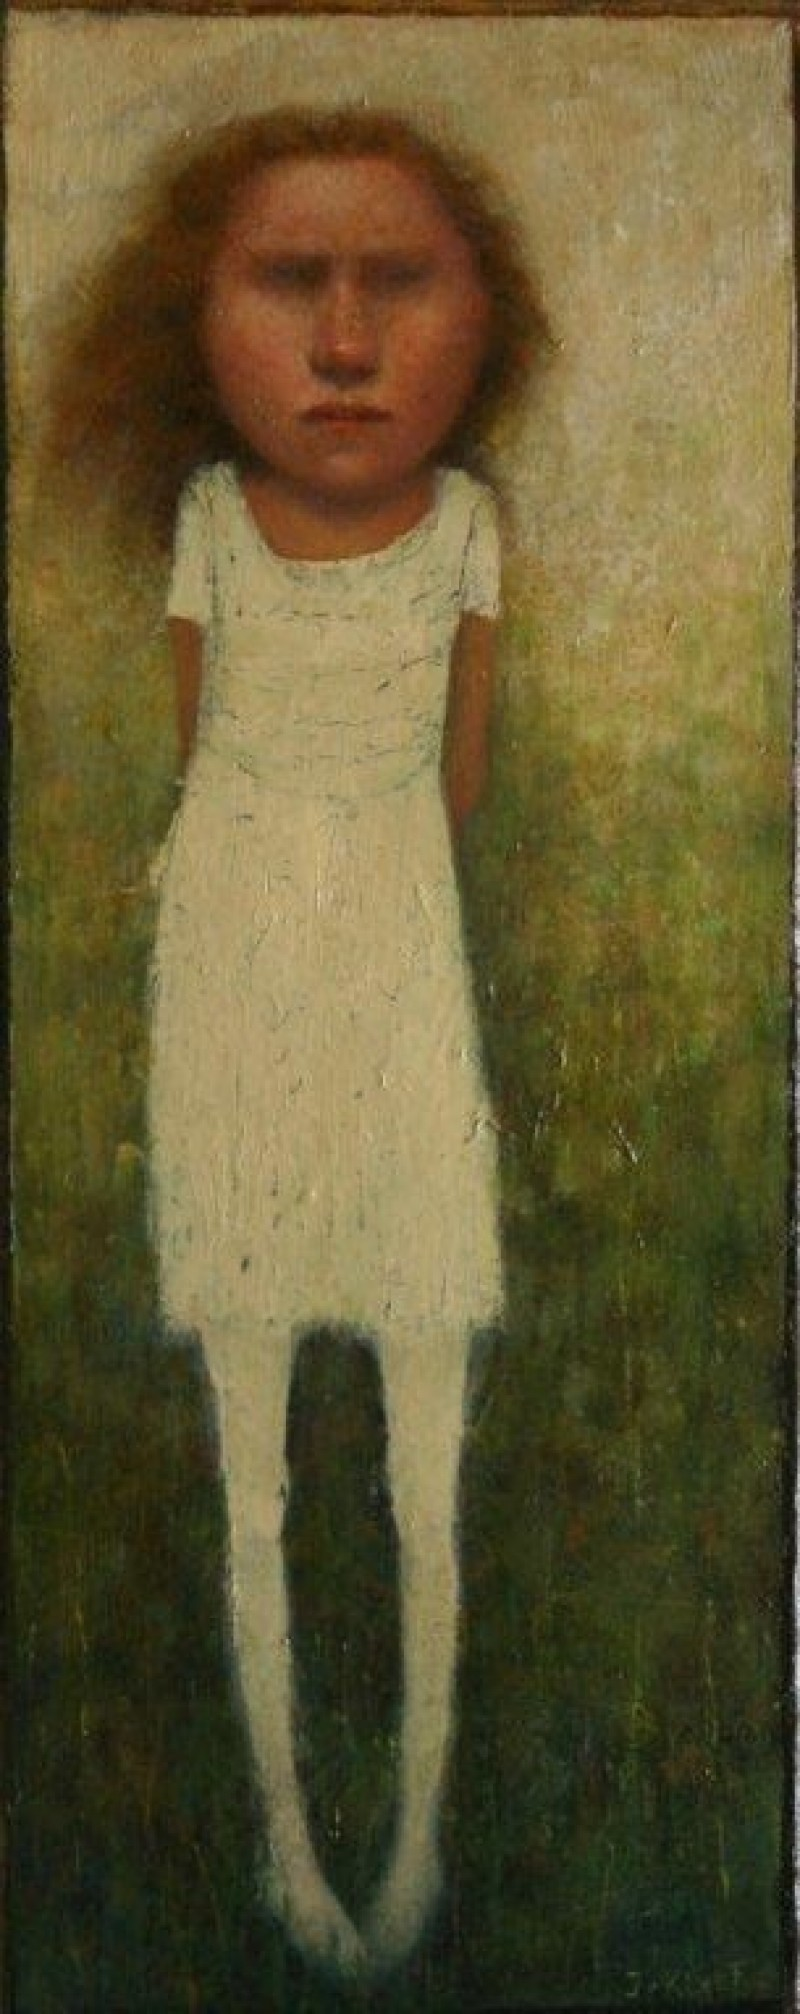 José van Kleef - Staand meisje in witte jurk